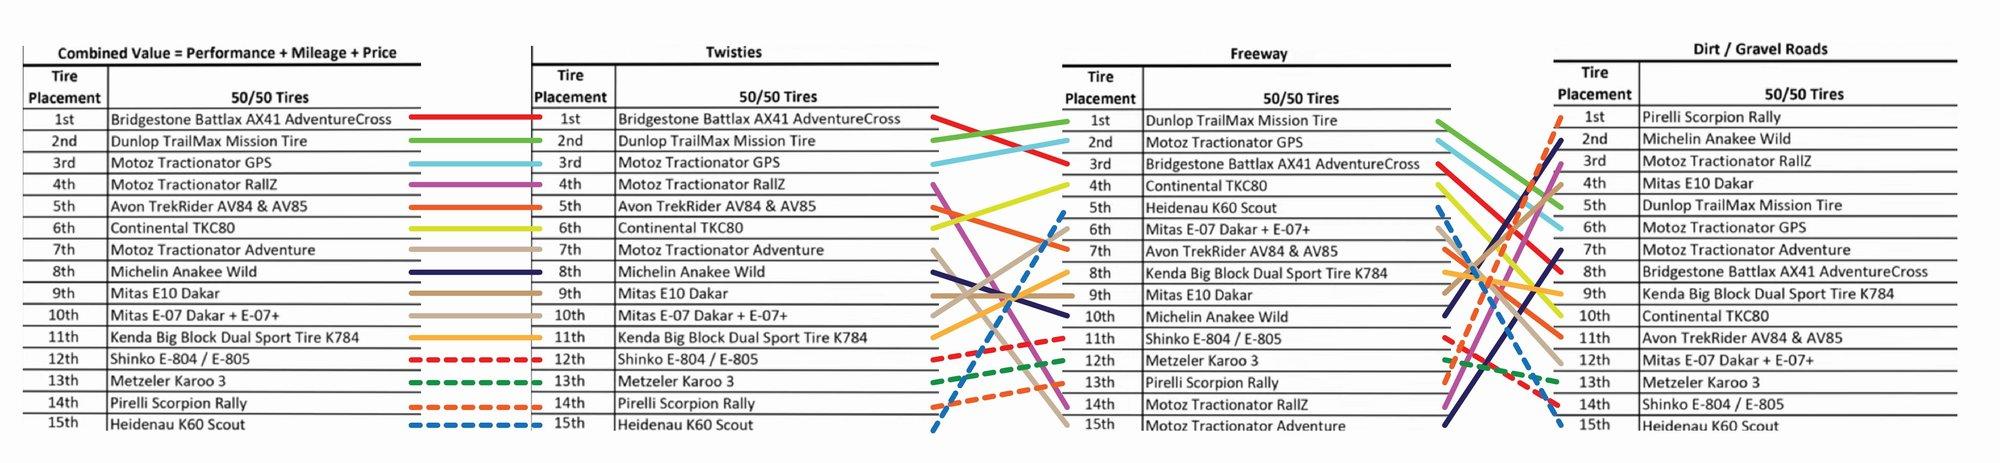 tyre cross ref diagram.jpg